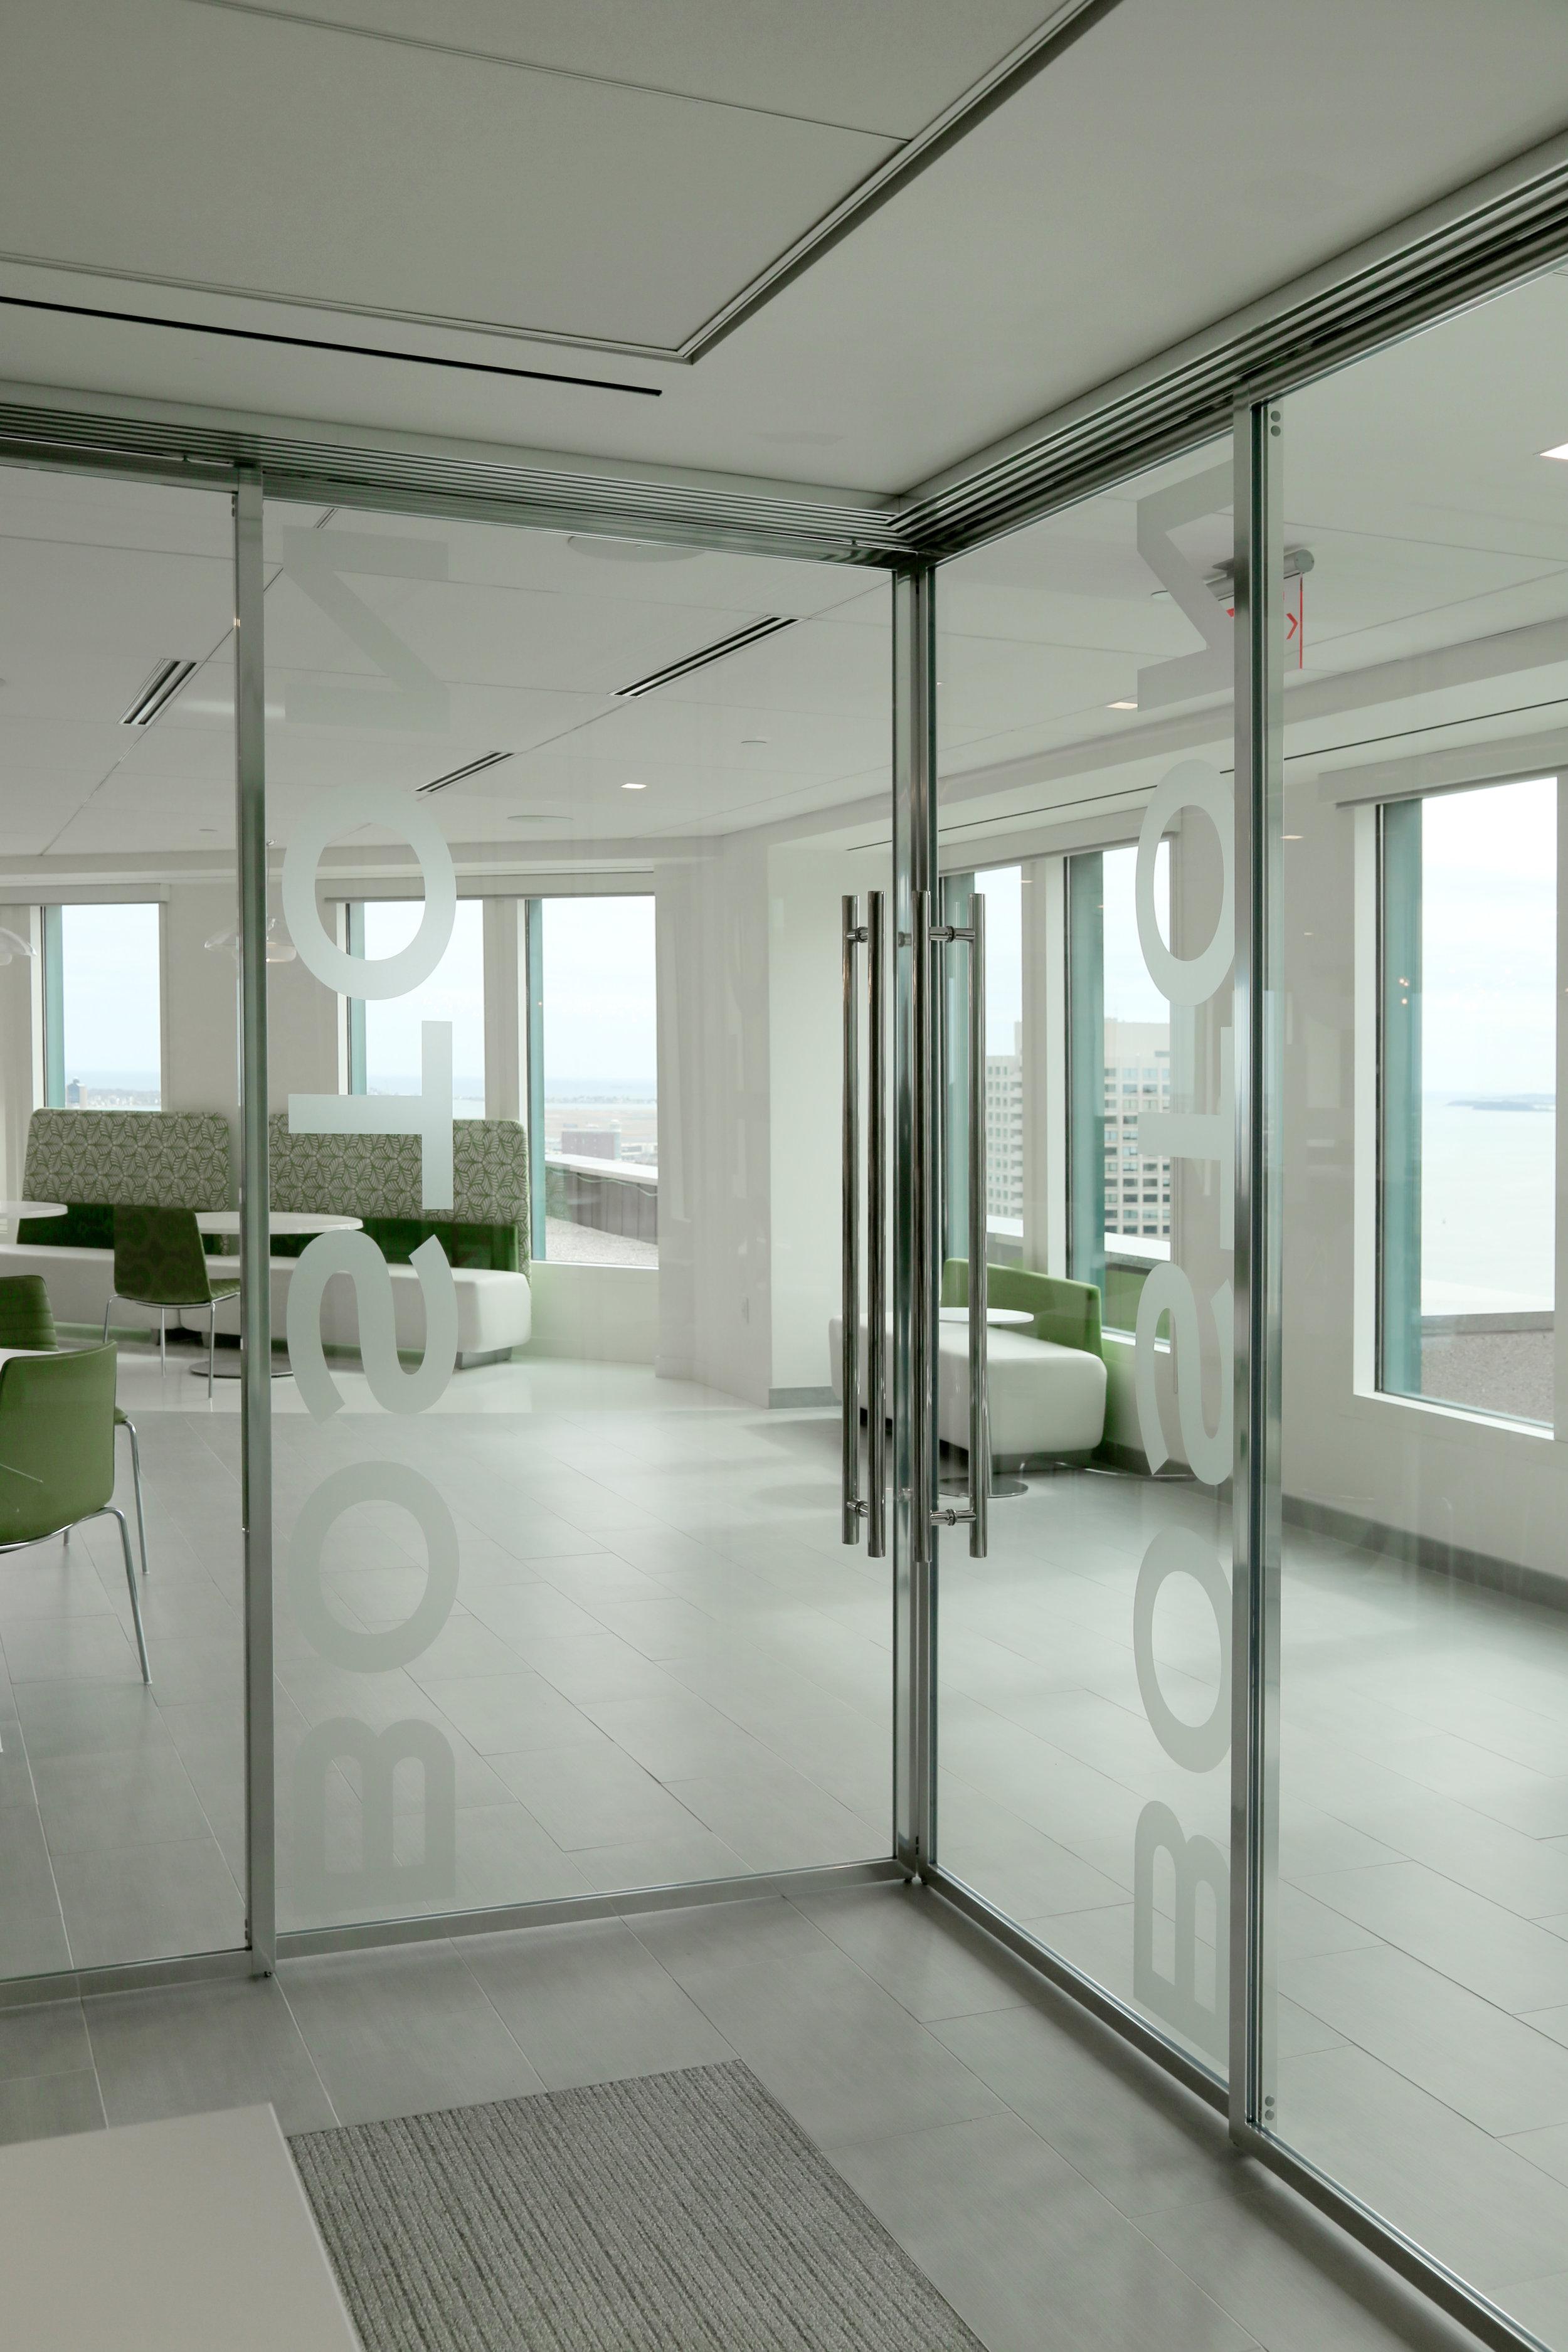 Closed Perpendicular Corner Sliding Door Condition Glass Walls - Spaceworks AI.jpg